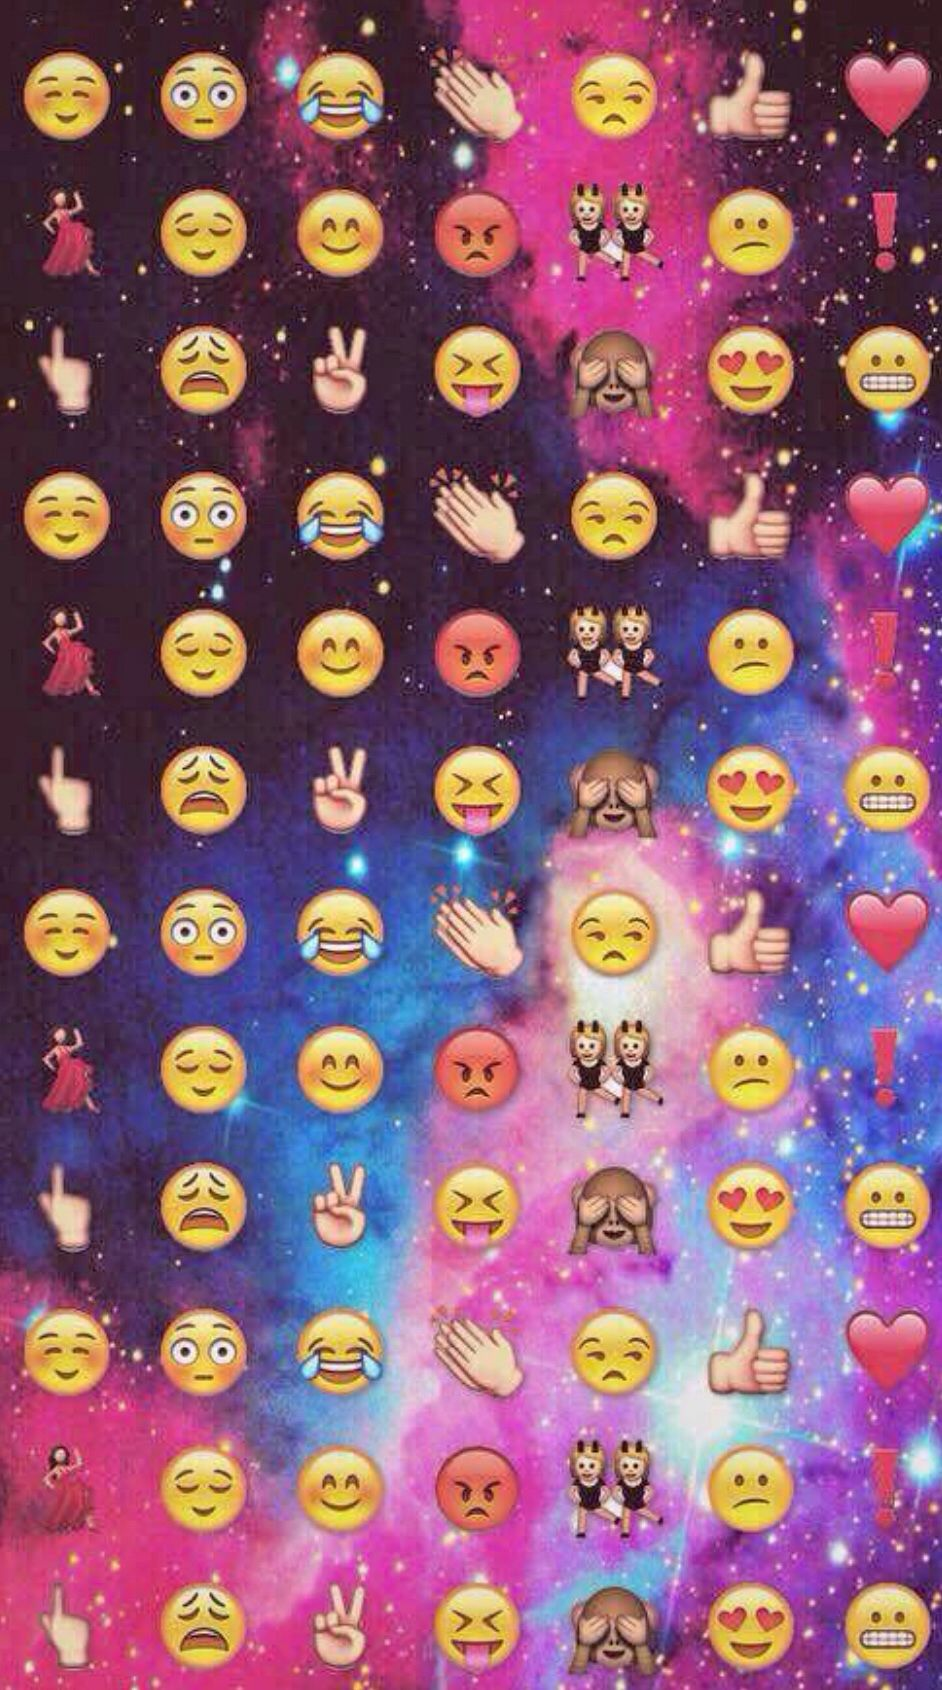 La on as tous plein d emojis!!! Emojis Pinterest Emojis